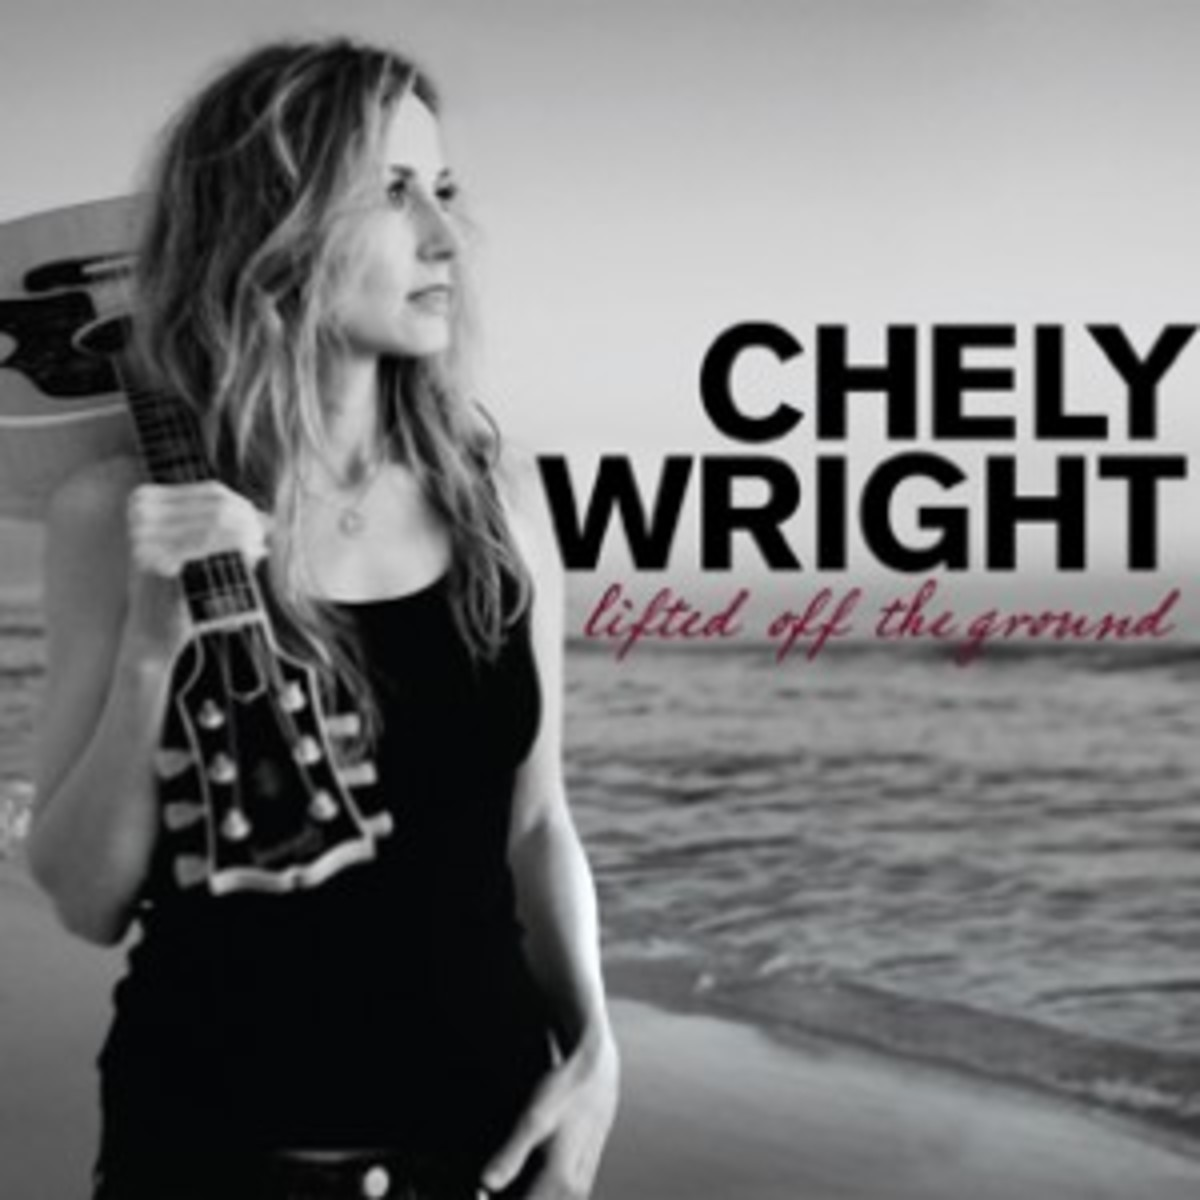 ChelyWright.LiftedOffTheGround